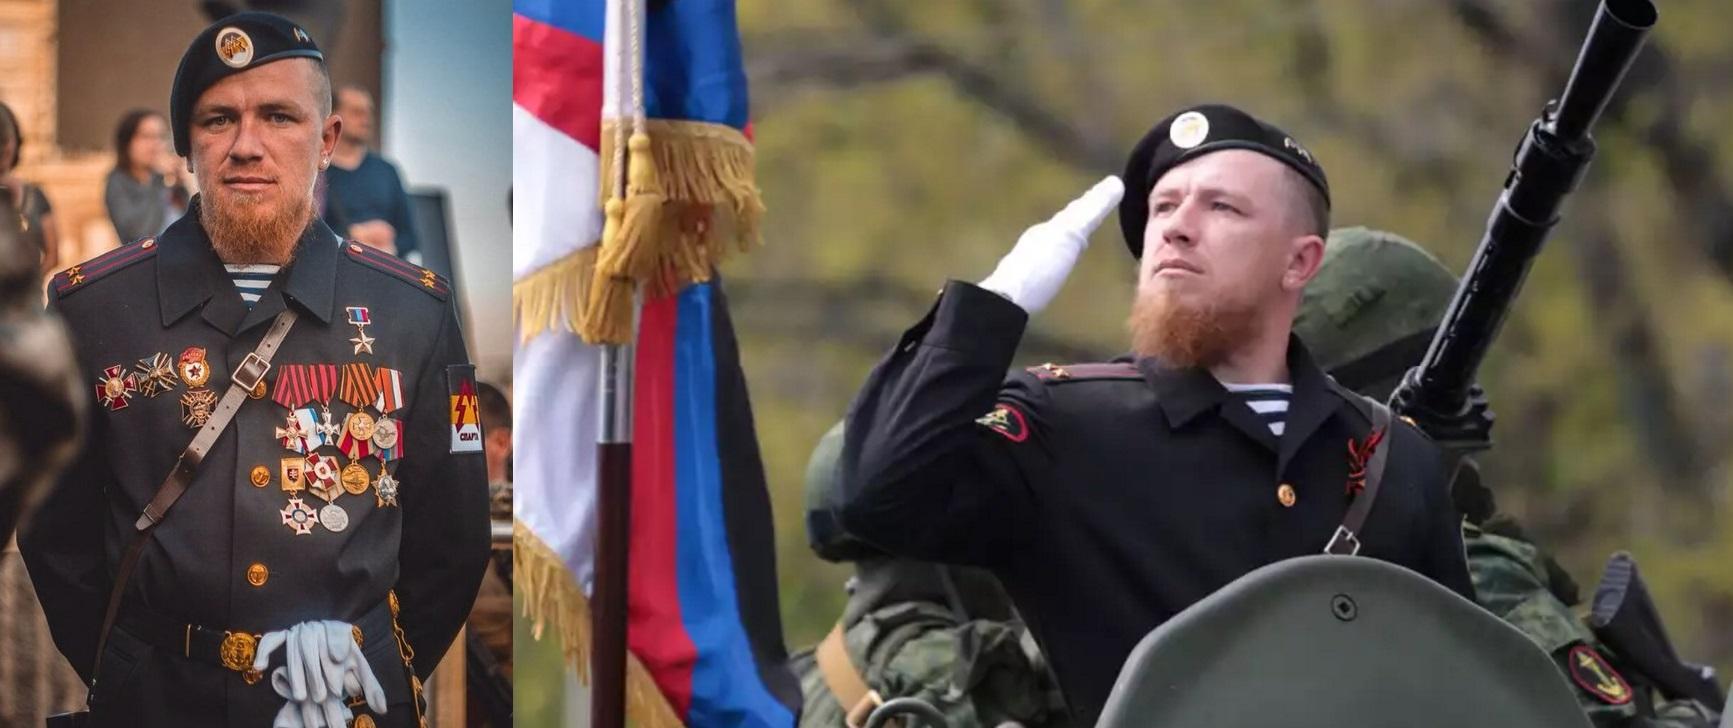 Арсений Павлов на параде в Донецке